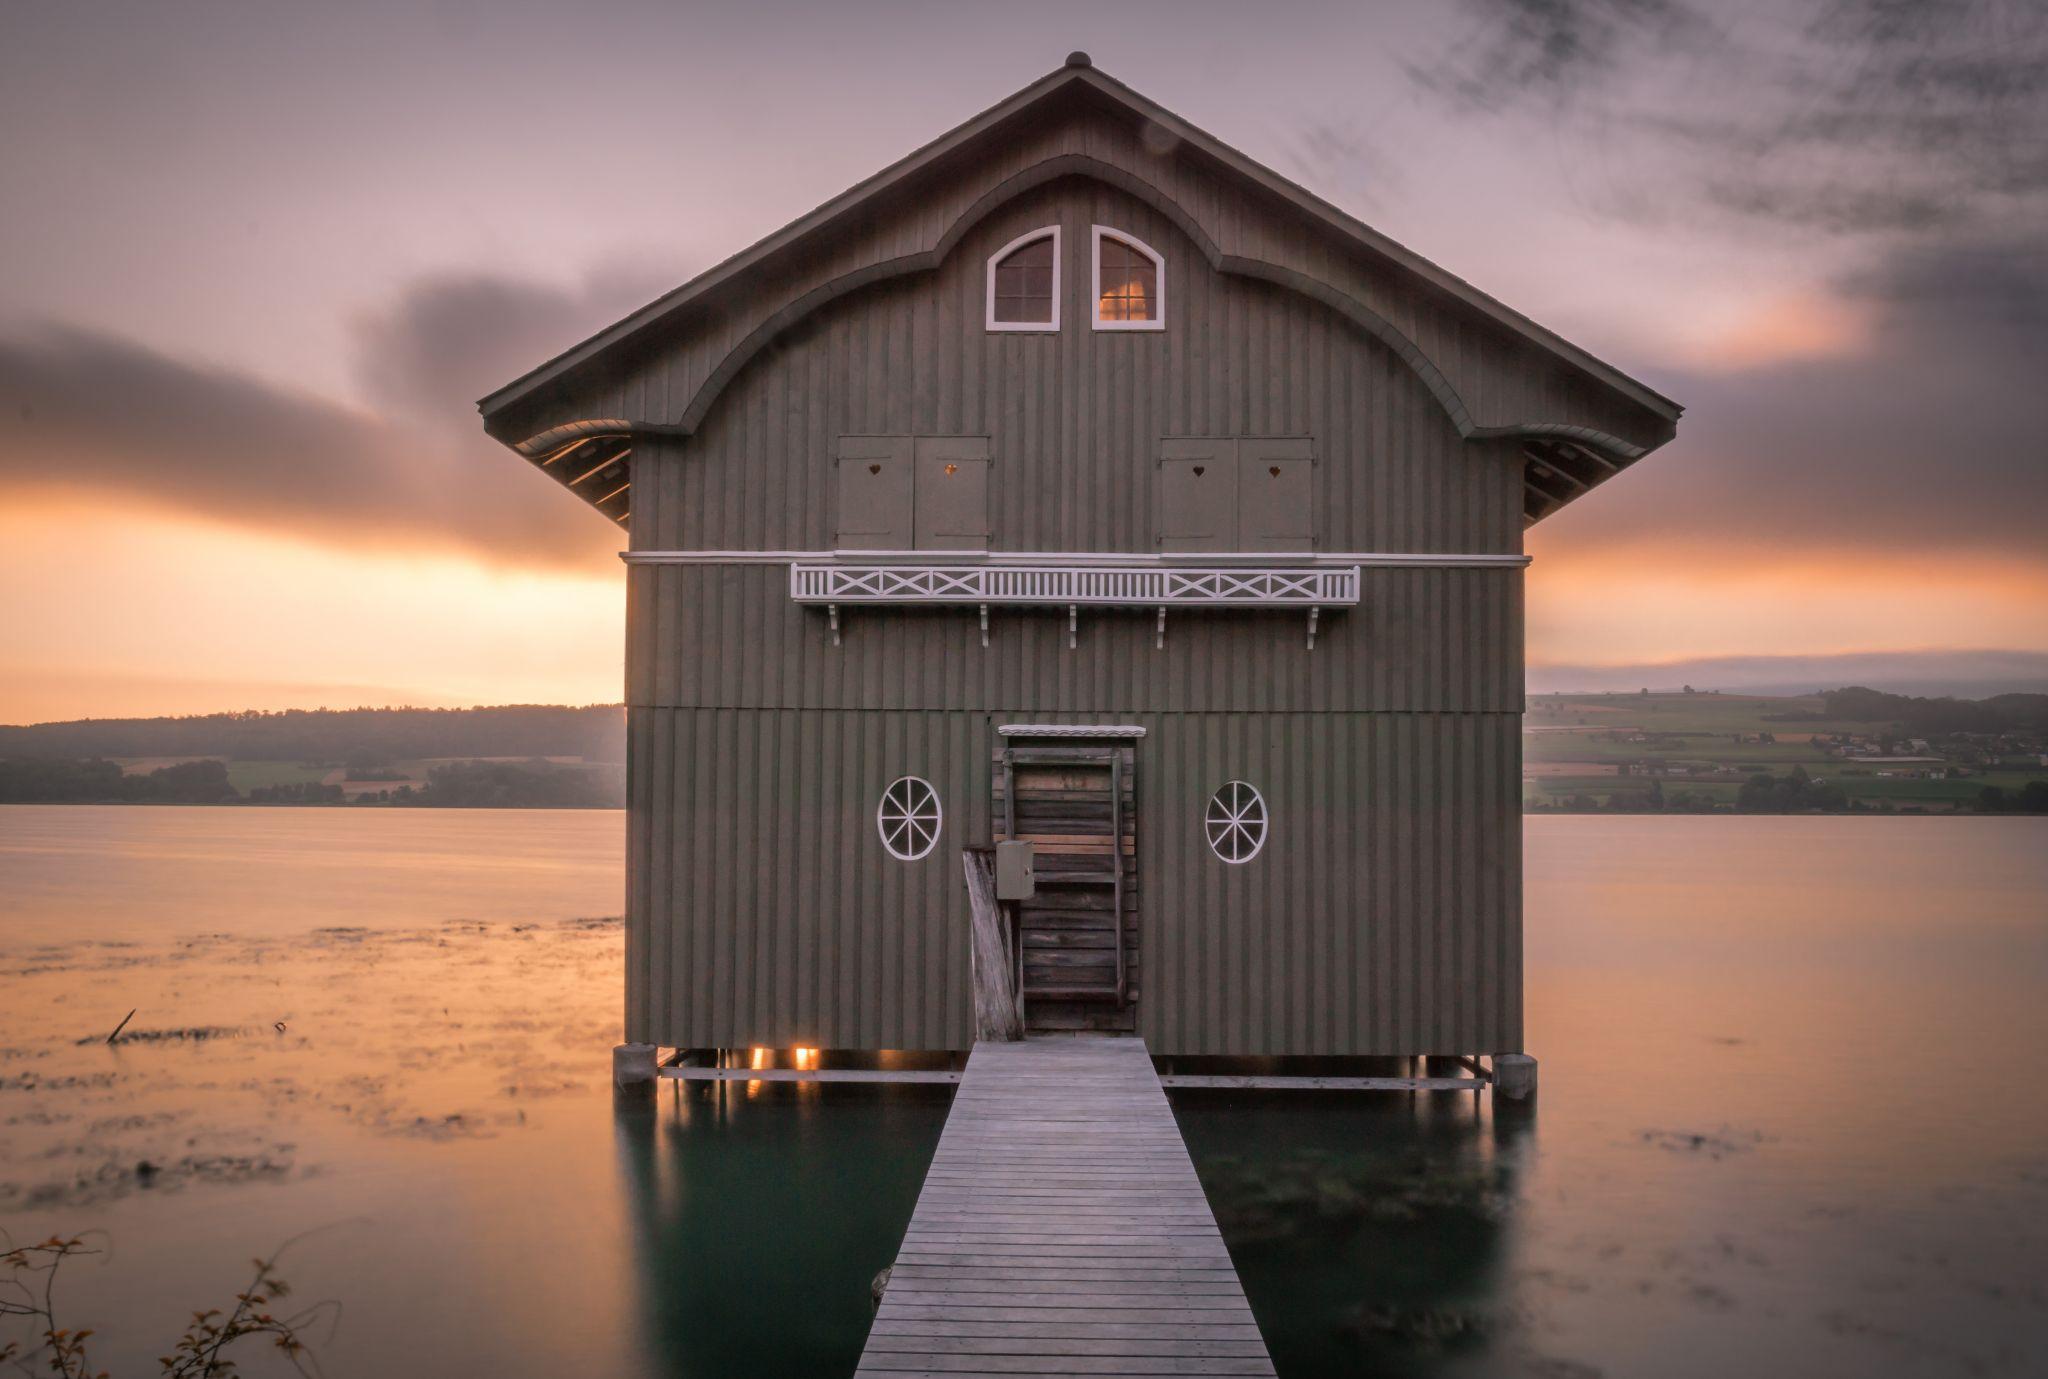 Boathouse Beinwil am See, Switzerland